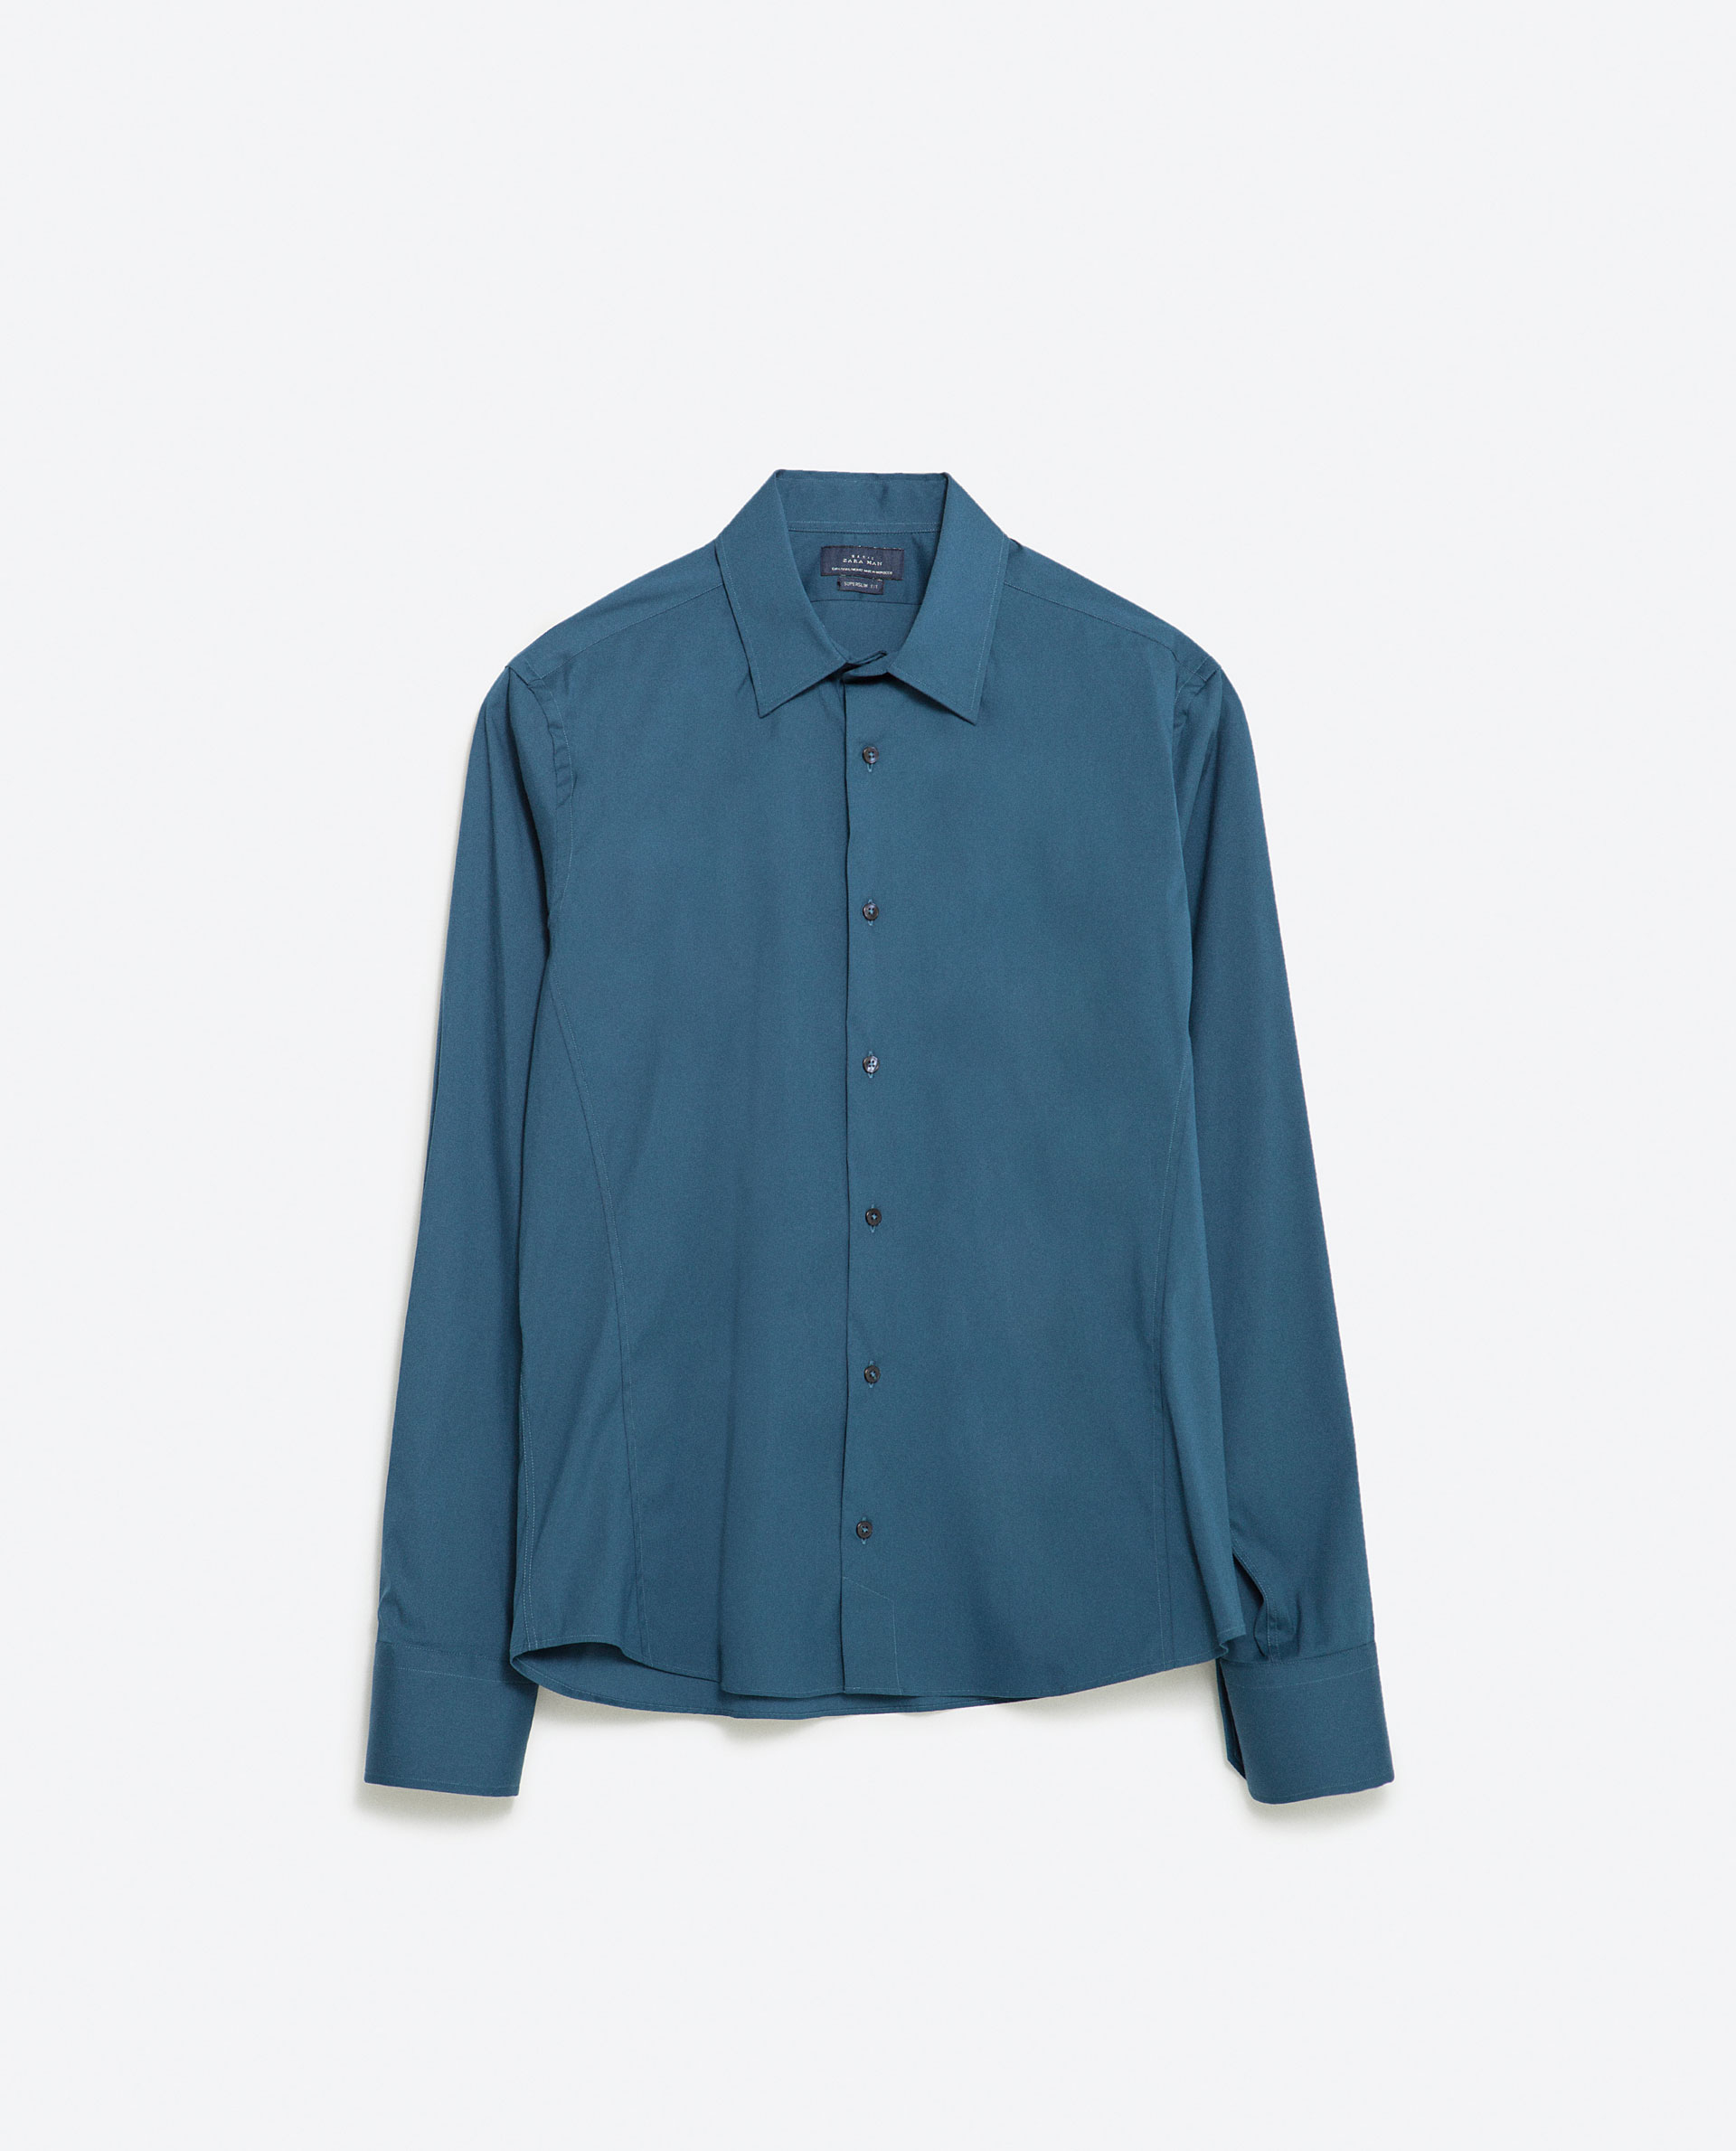 Zara Stretch Shirt in Blue for Men (Petrol blue) | Lyst